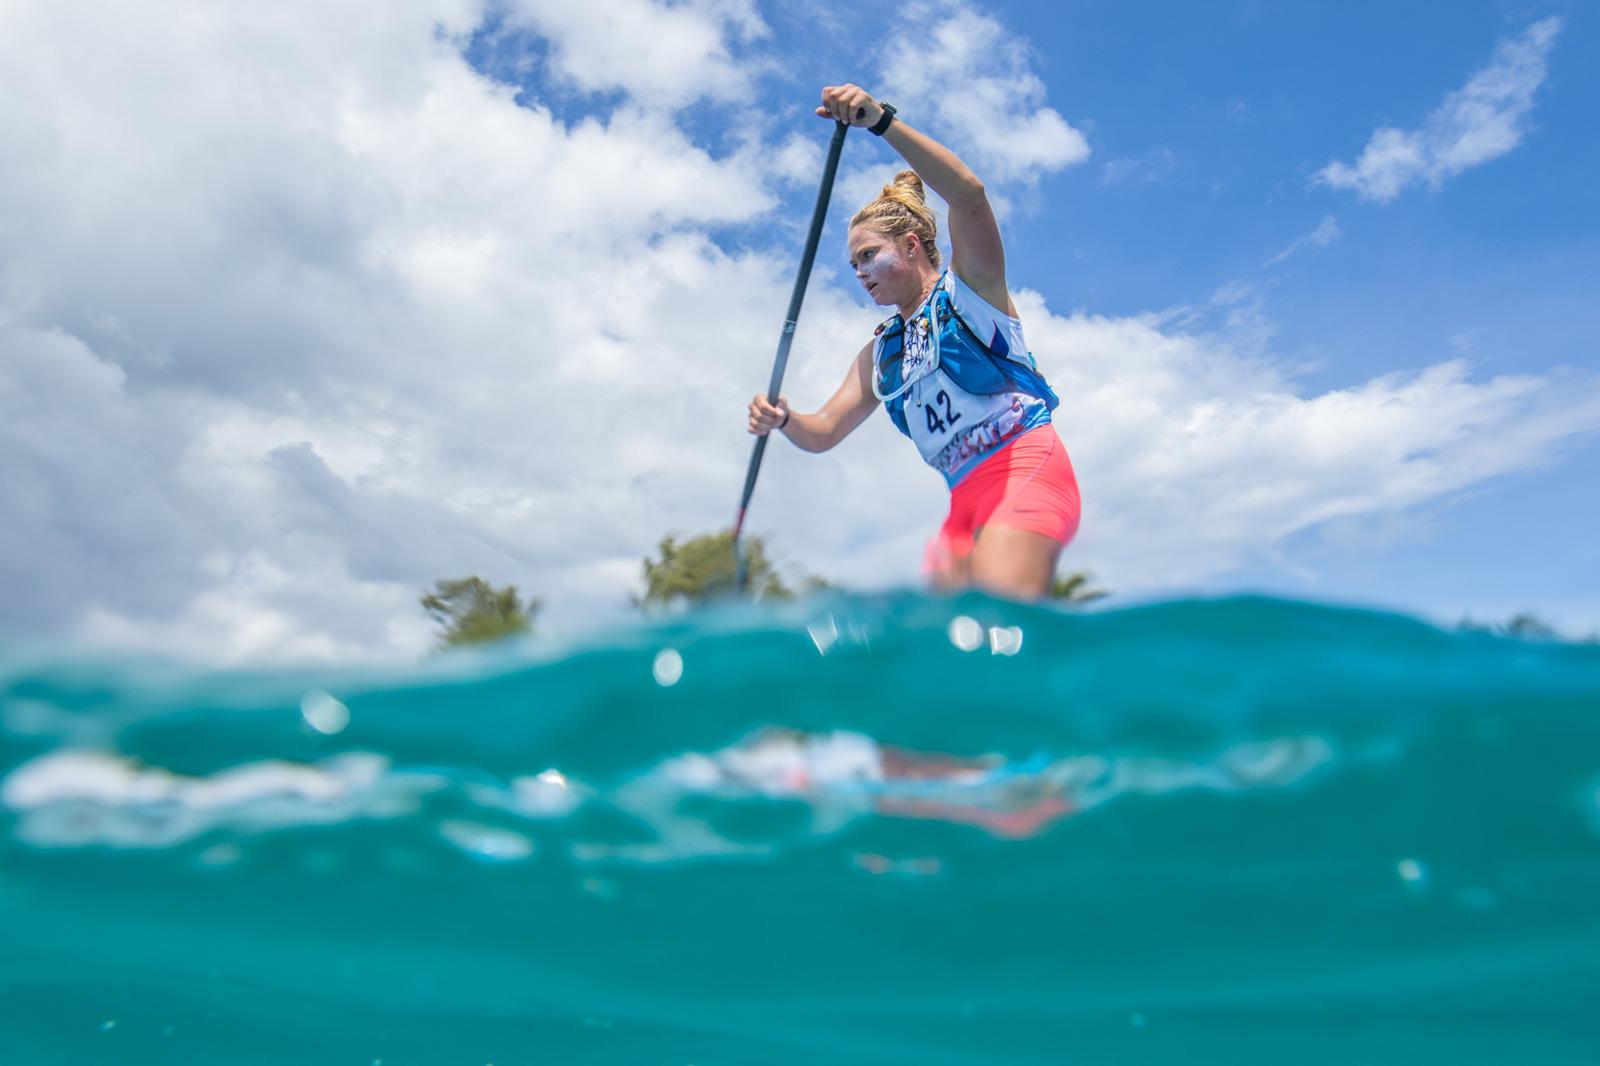 Air-France-Paddle-Festival-2018-Tahiti-Fiona-Wylde-USA-2-photo-credit-Georgia-Schoefield